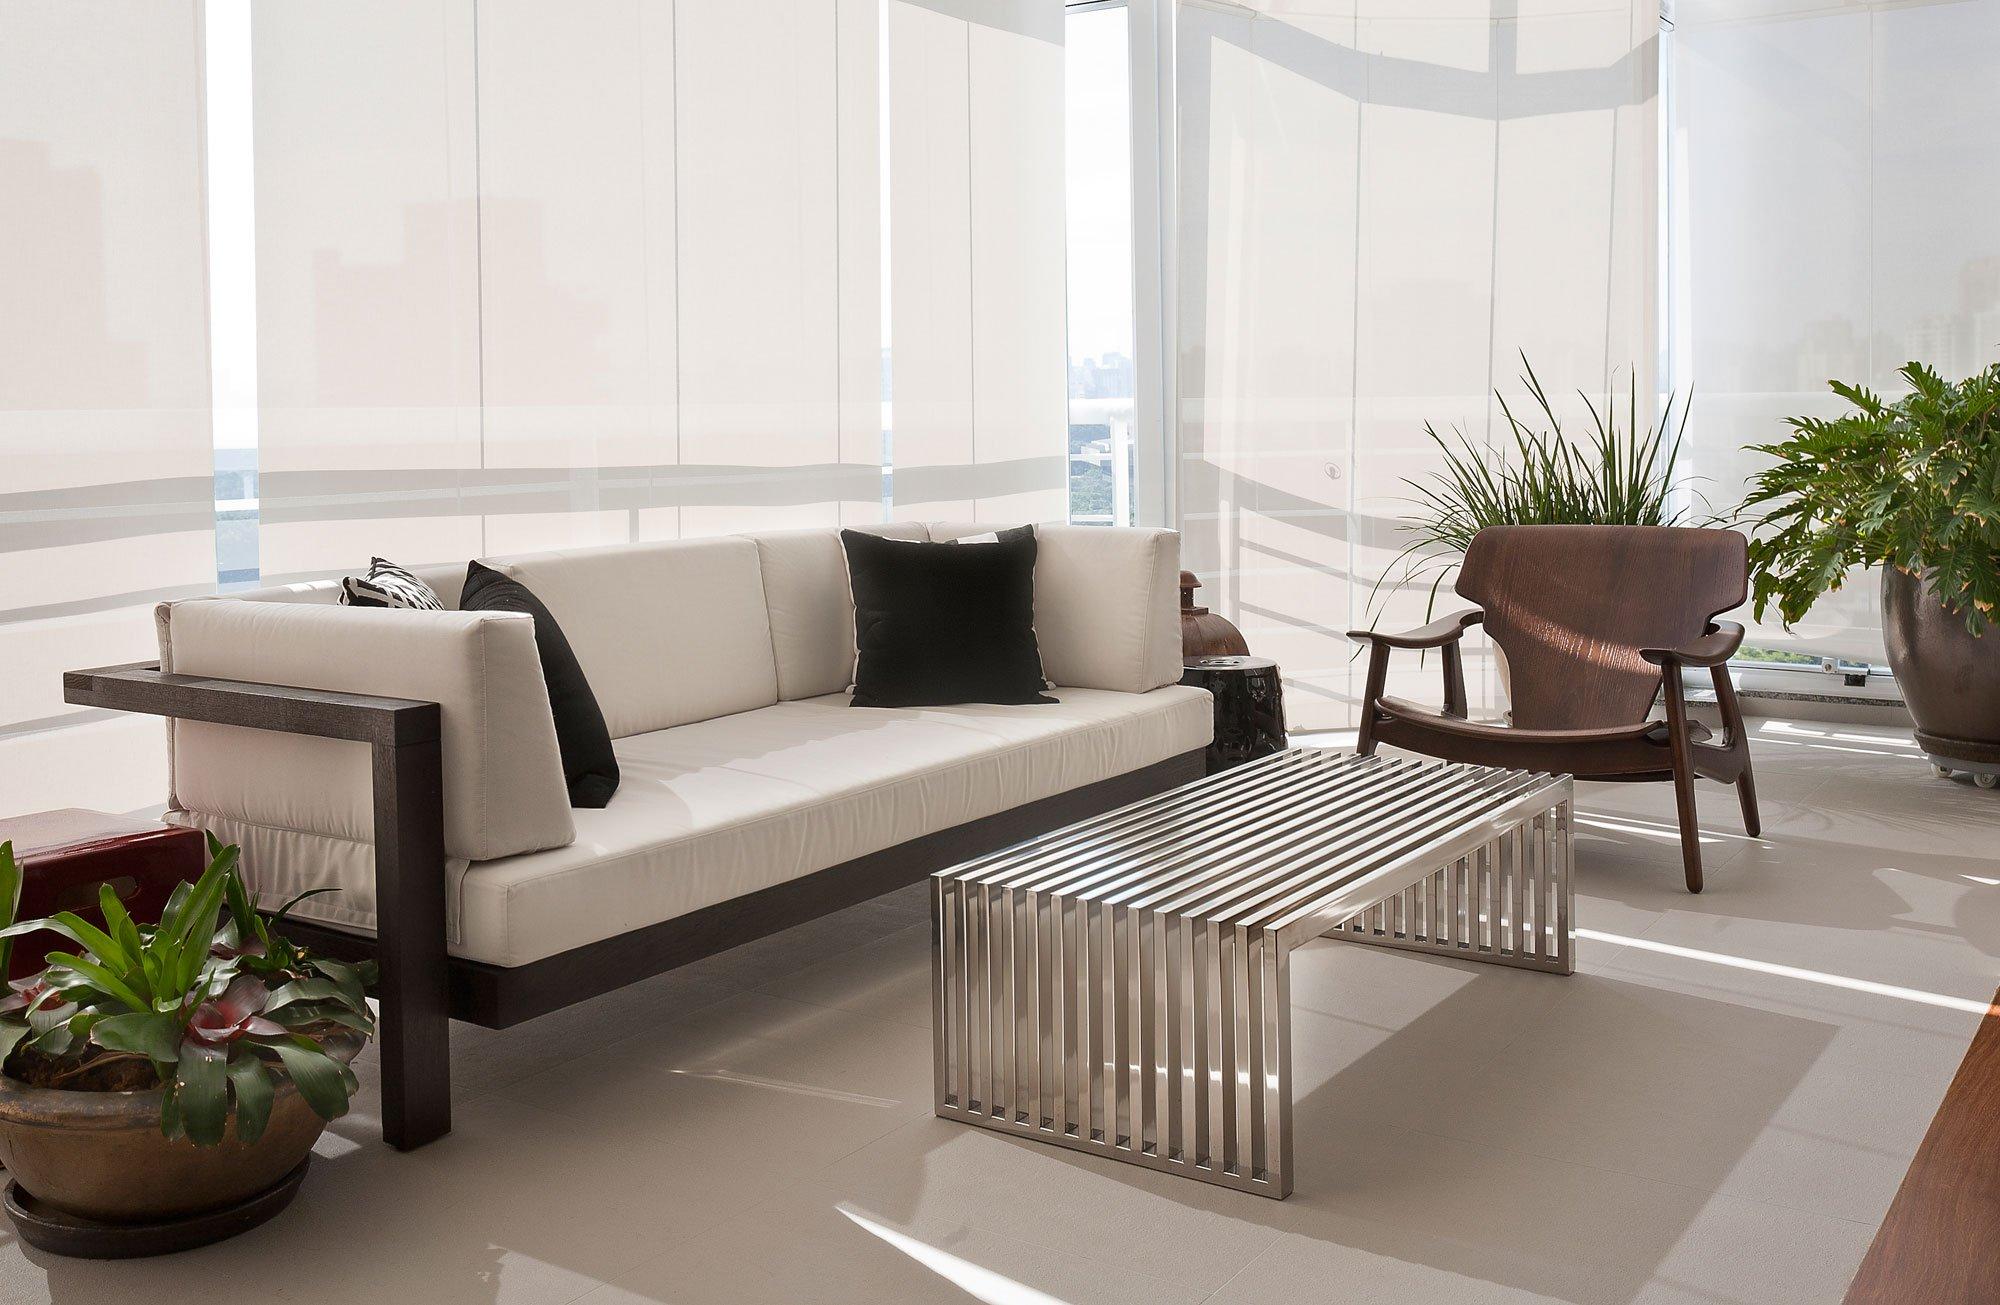 An-Elegant-Interior-12